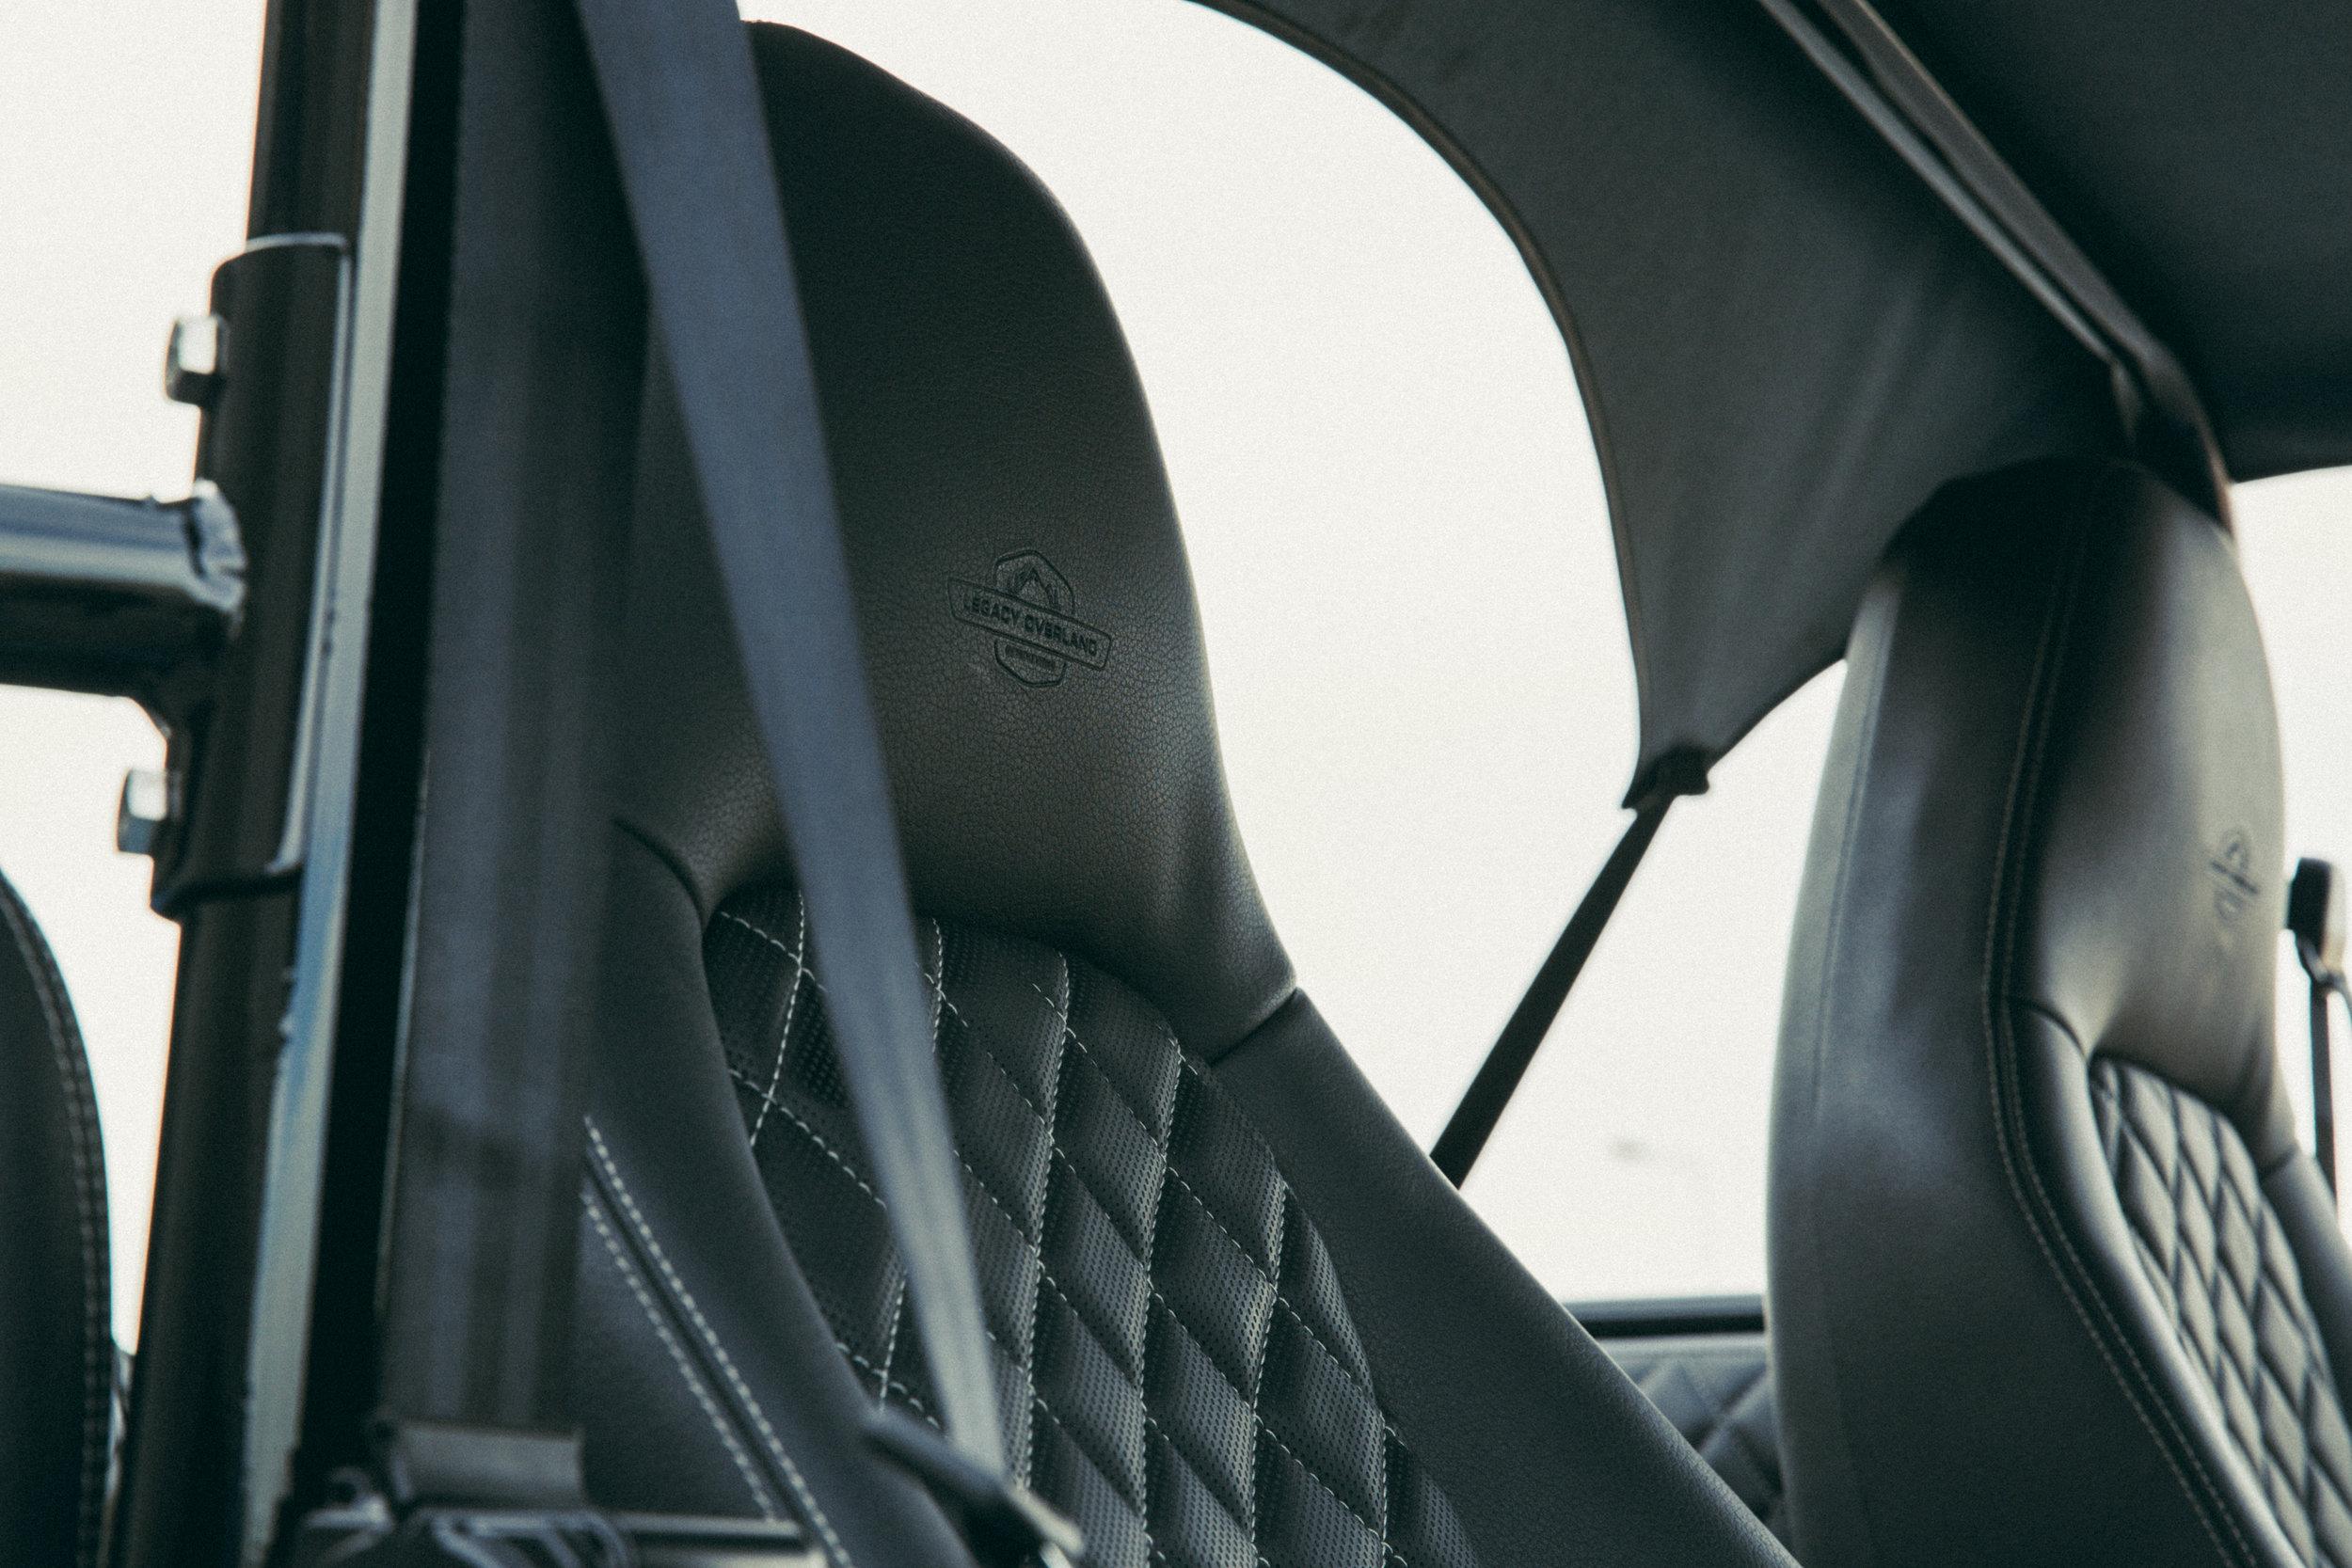 LegacyOverland_1980_ToyotaLandCruiser_FJ40_opentop_88.JPG